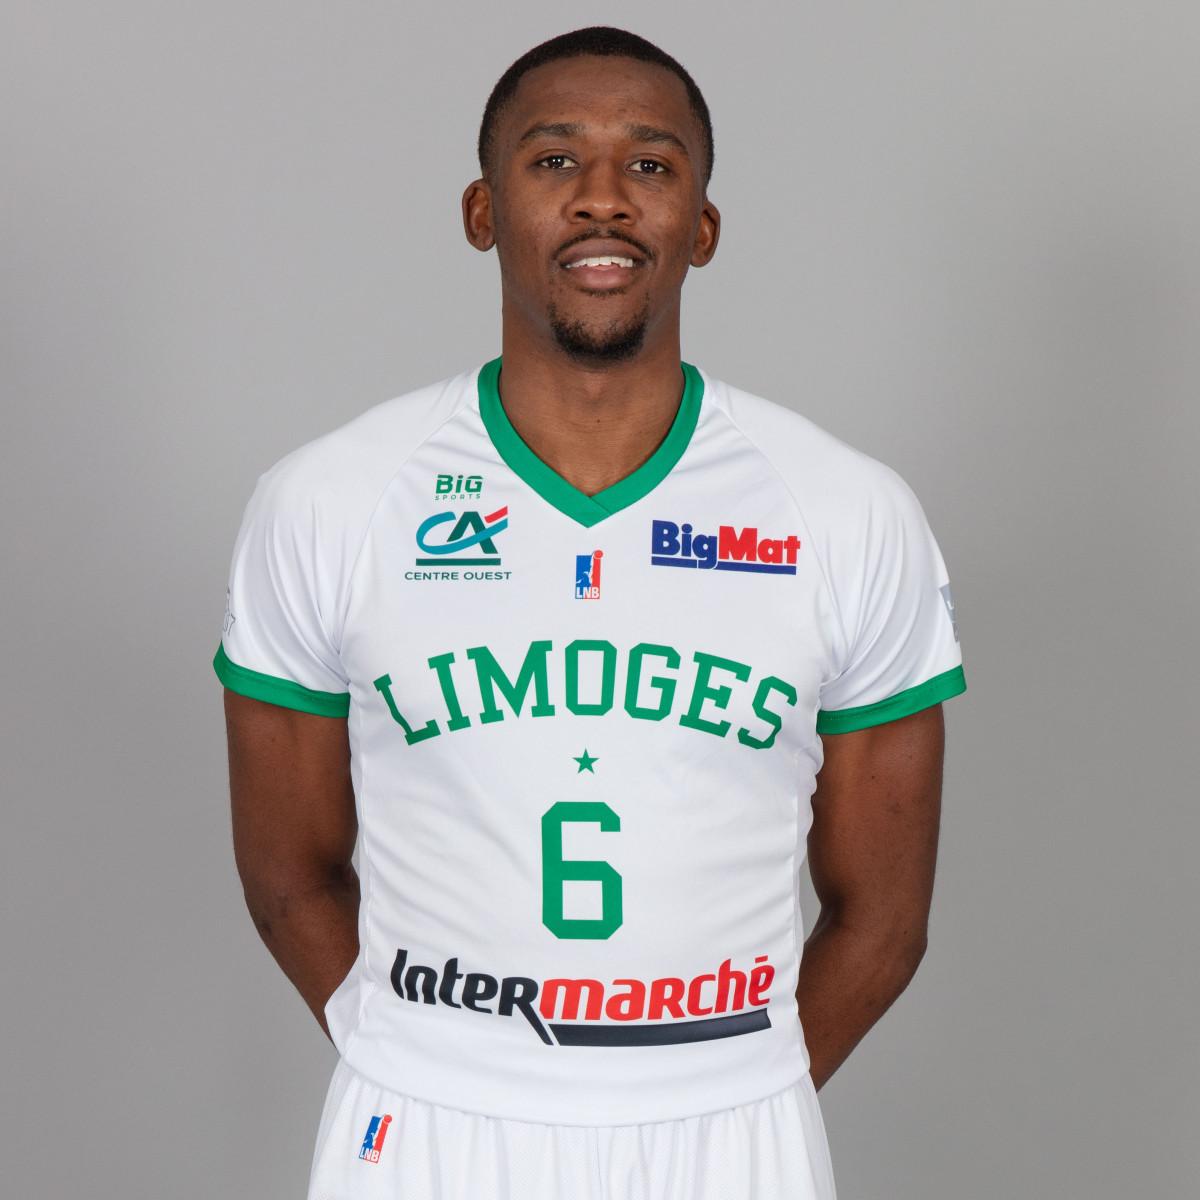 Photo of Semaj Christon, 2019-2020 season